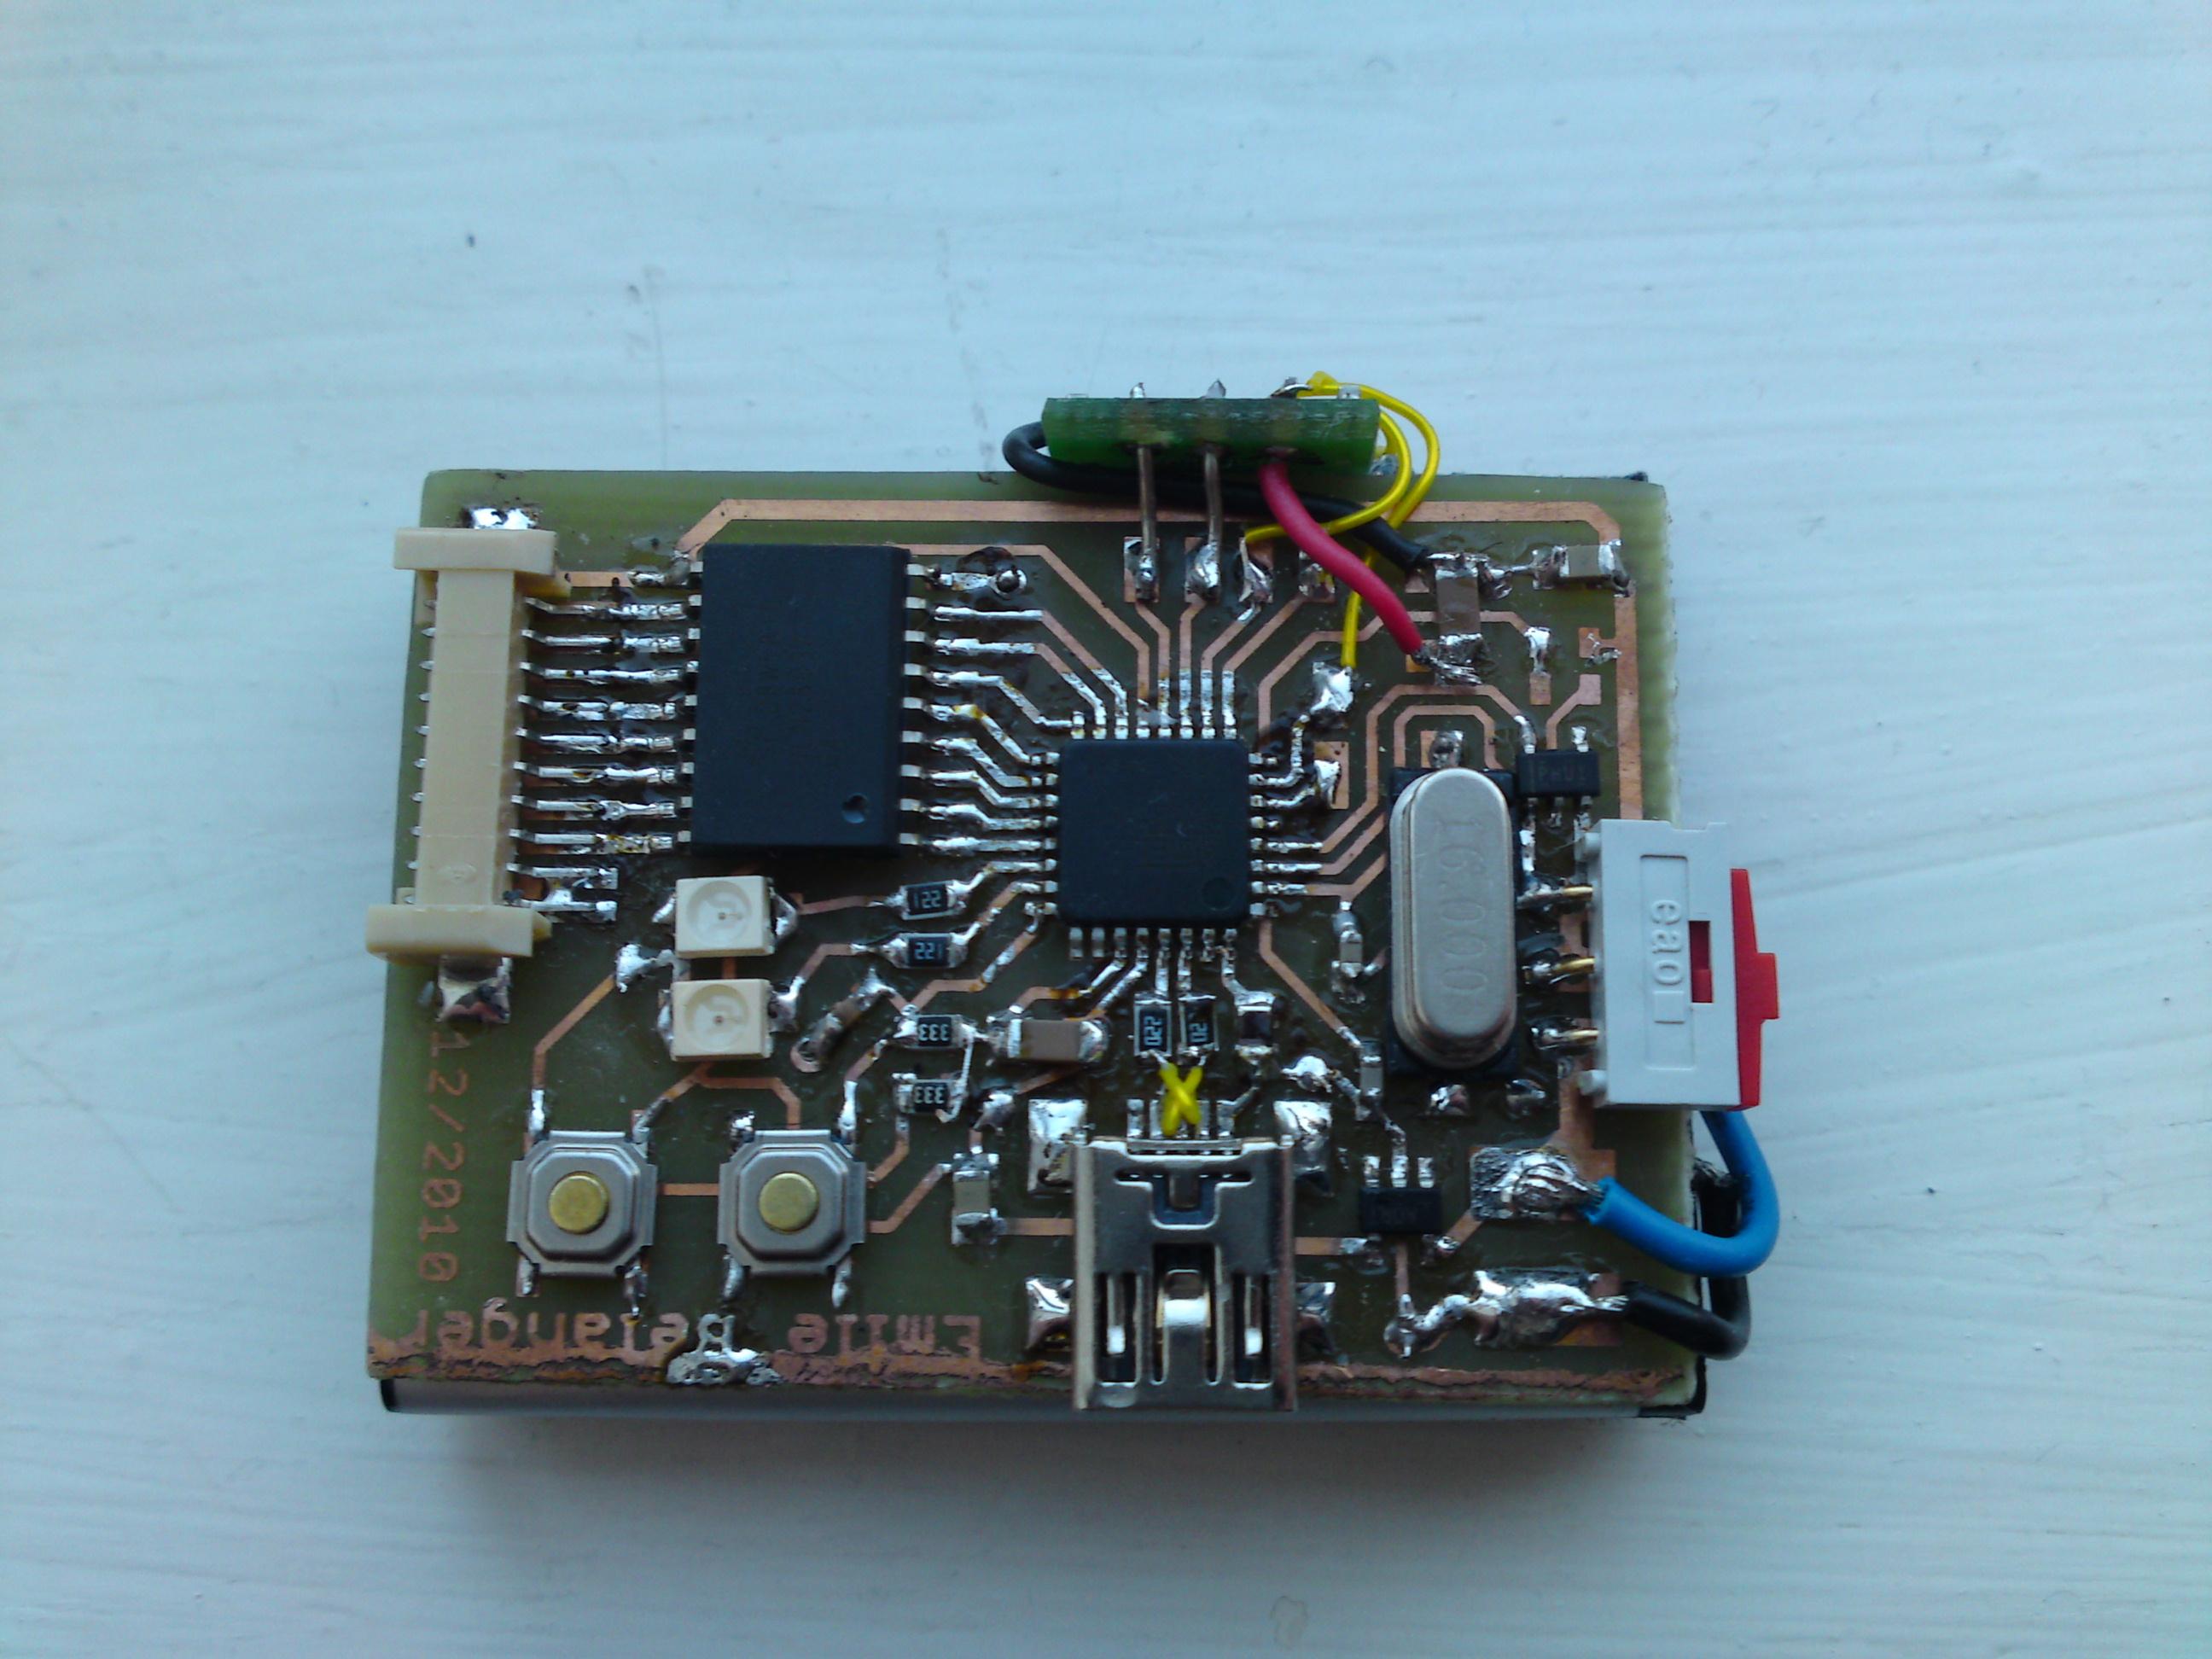 Compass Belt board soldered